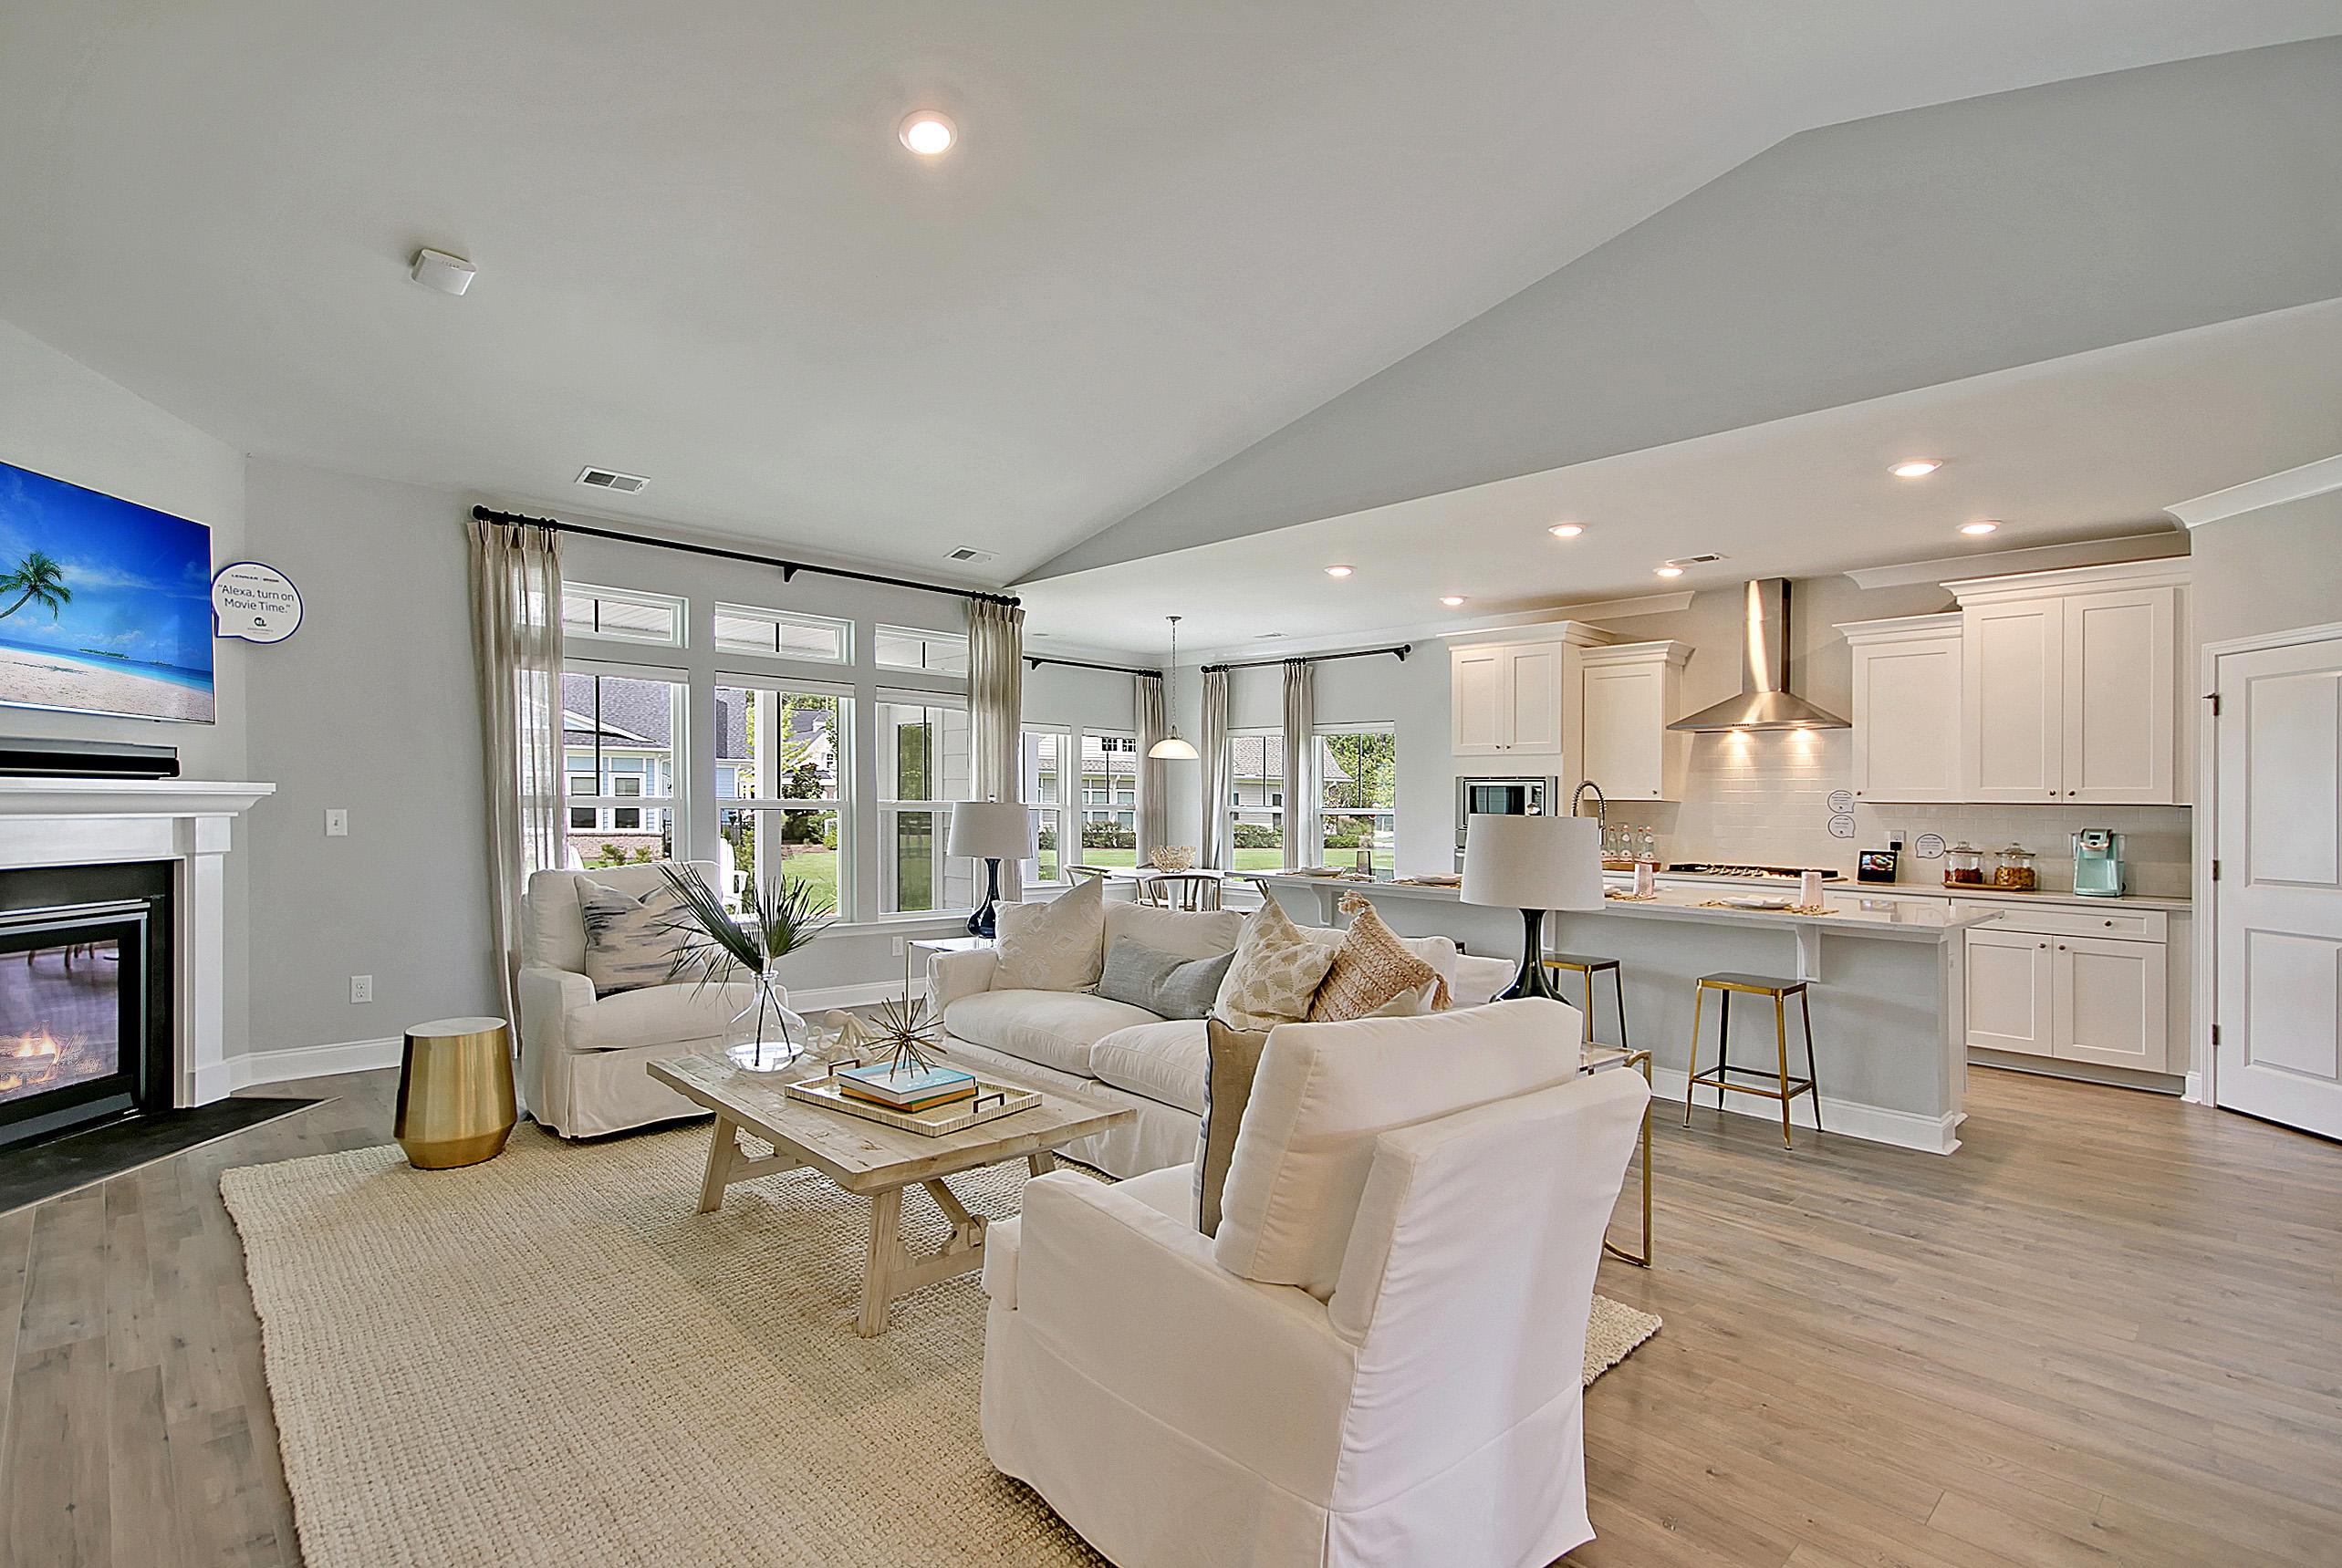 Park West Homes For Sale - 3066 Rice Field, Mount Pleasant, SC - 34